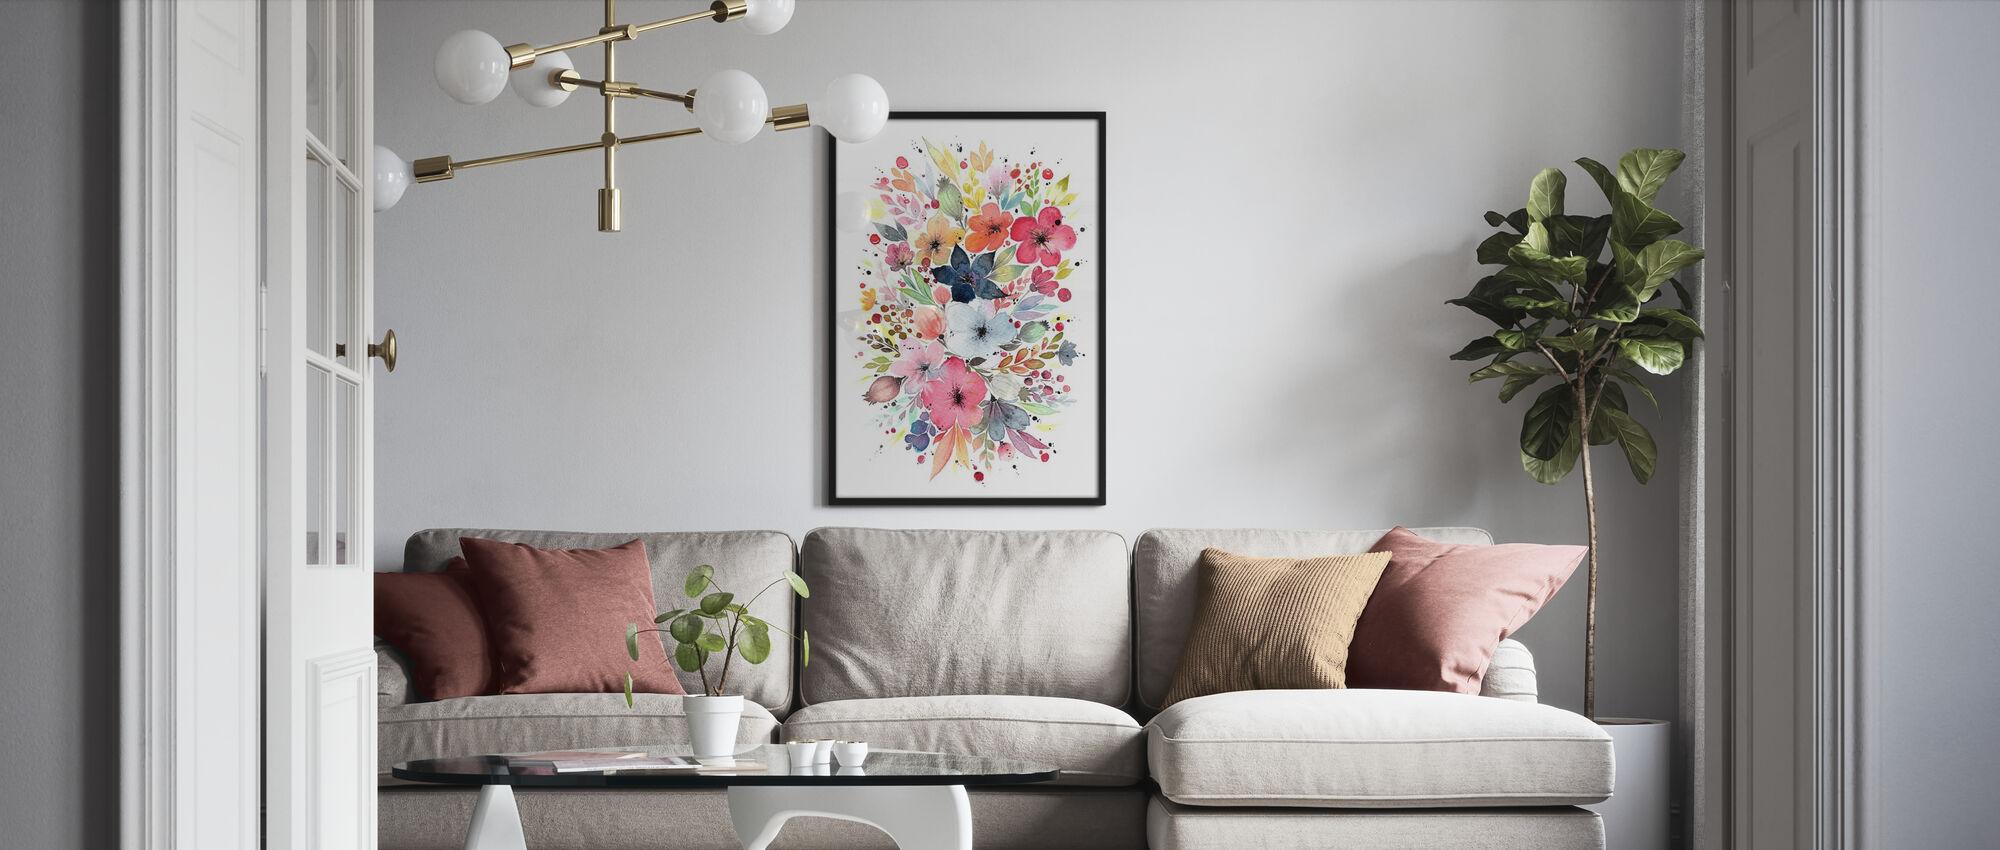 Blomma Bukett - Inramad tavla - Vardagsrum